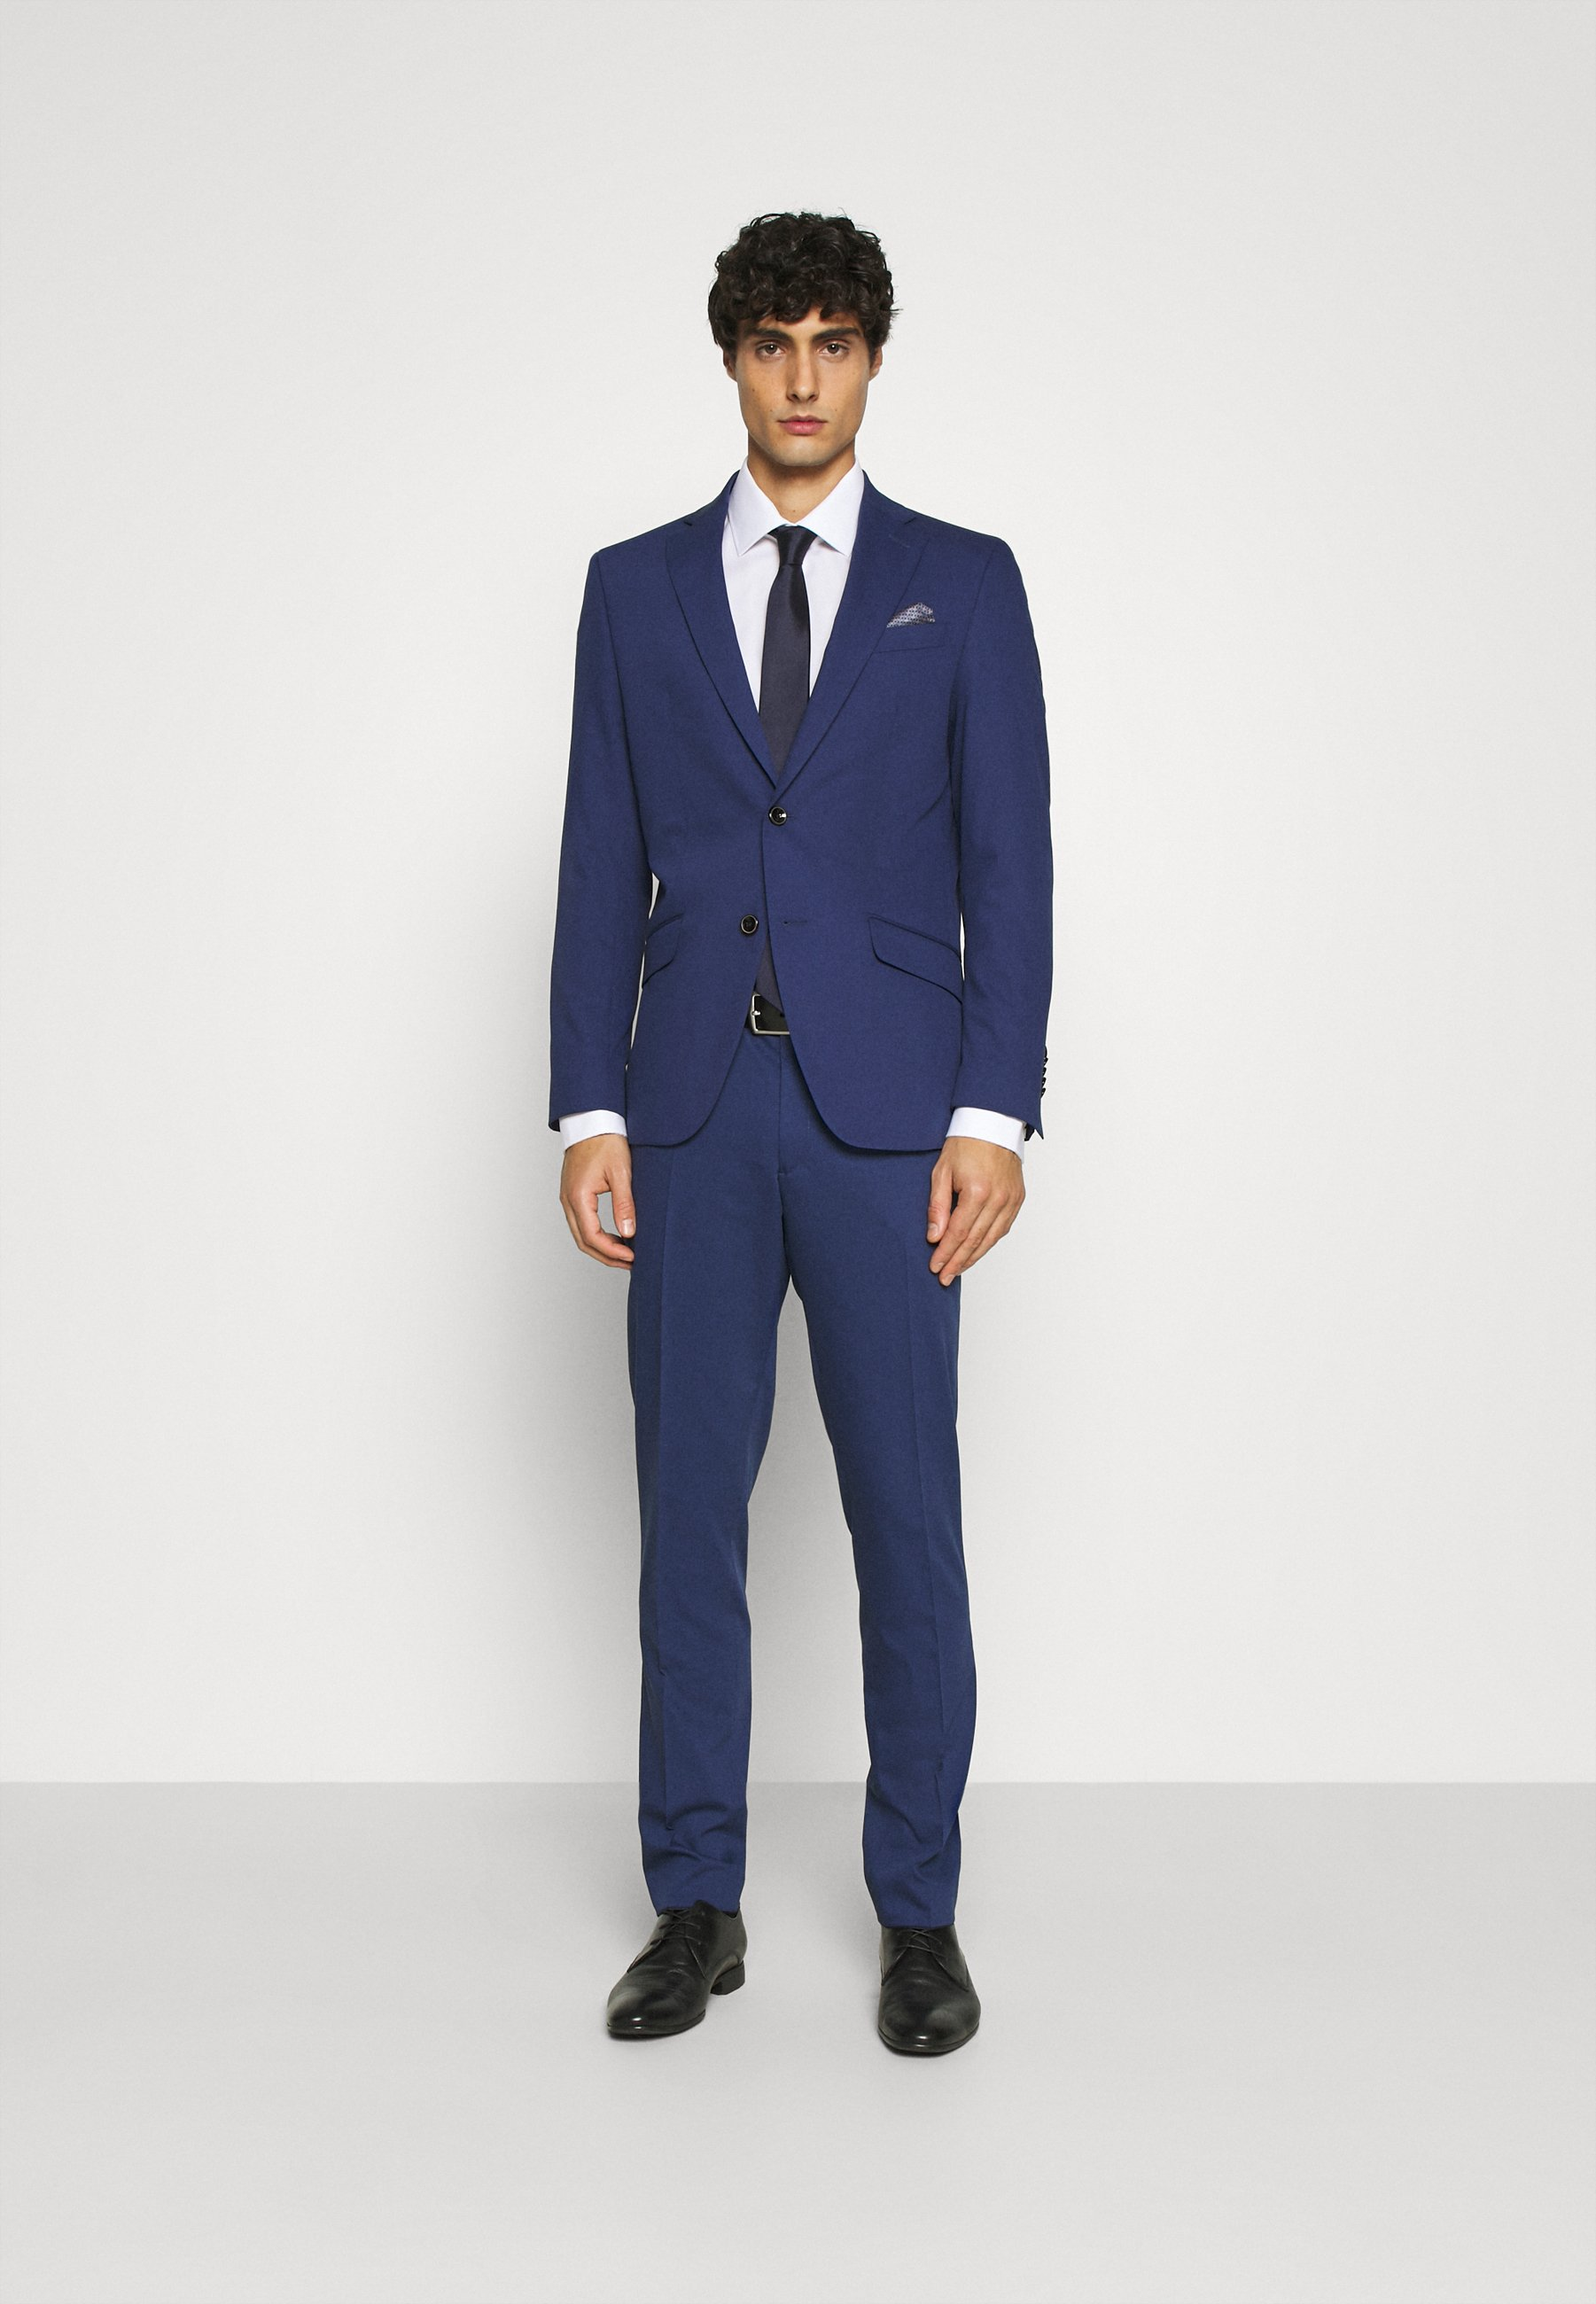 Kostymer | Herr Storlek 60 | Köp din kostym online på Zalando.se